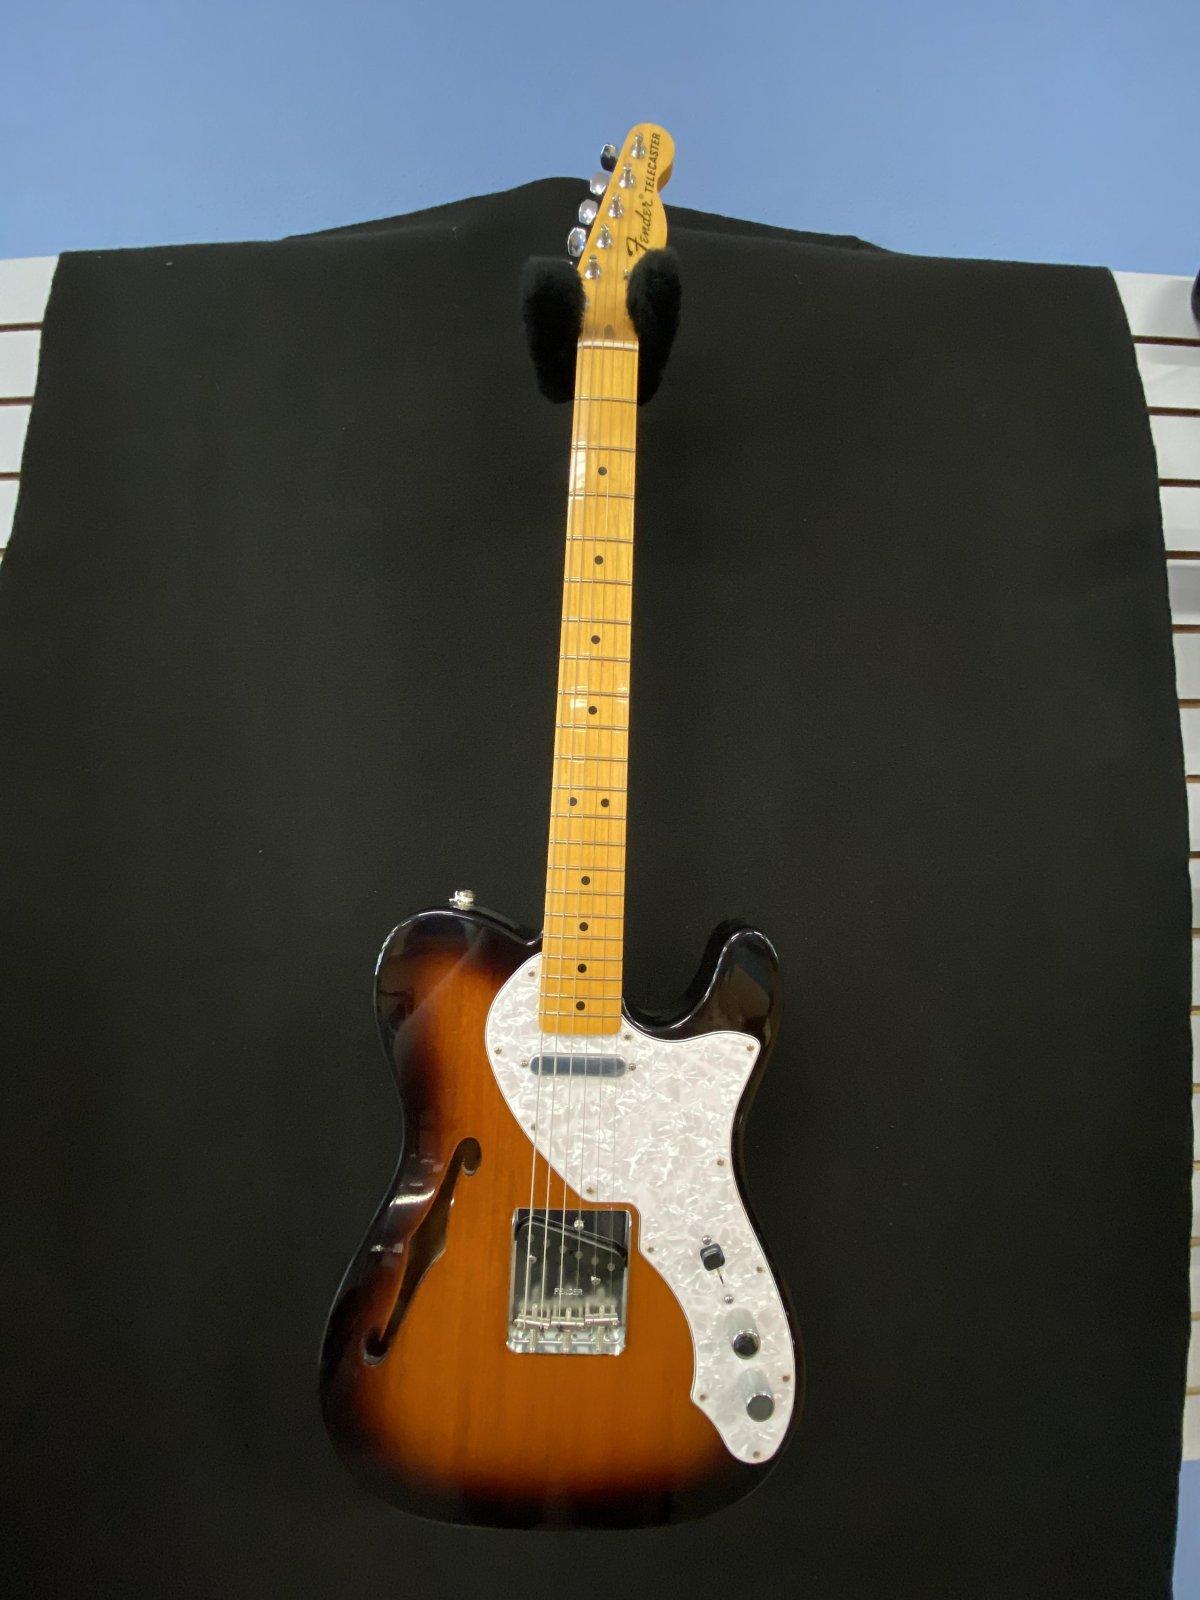 Fender Telecaster Thineline semi hollow